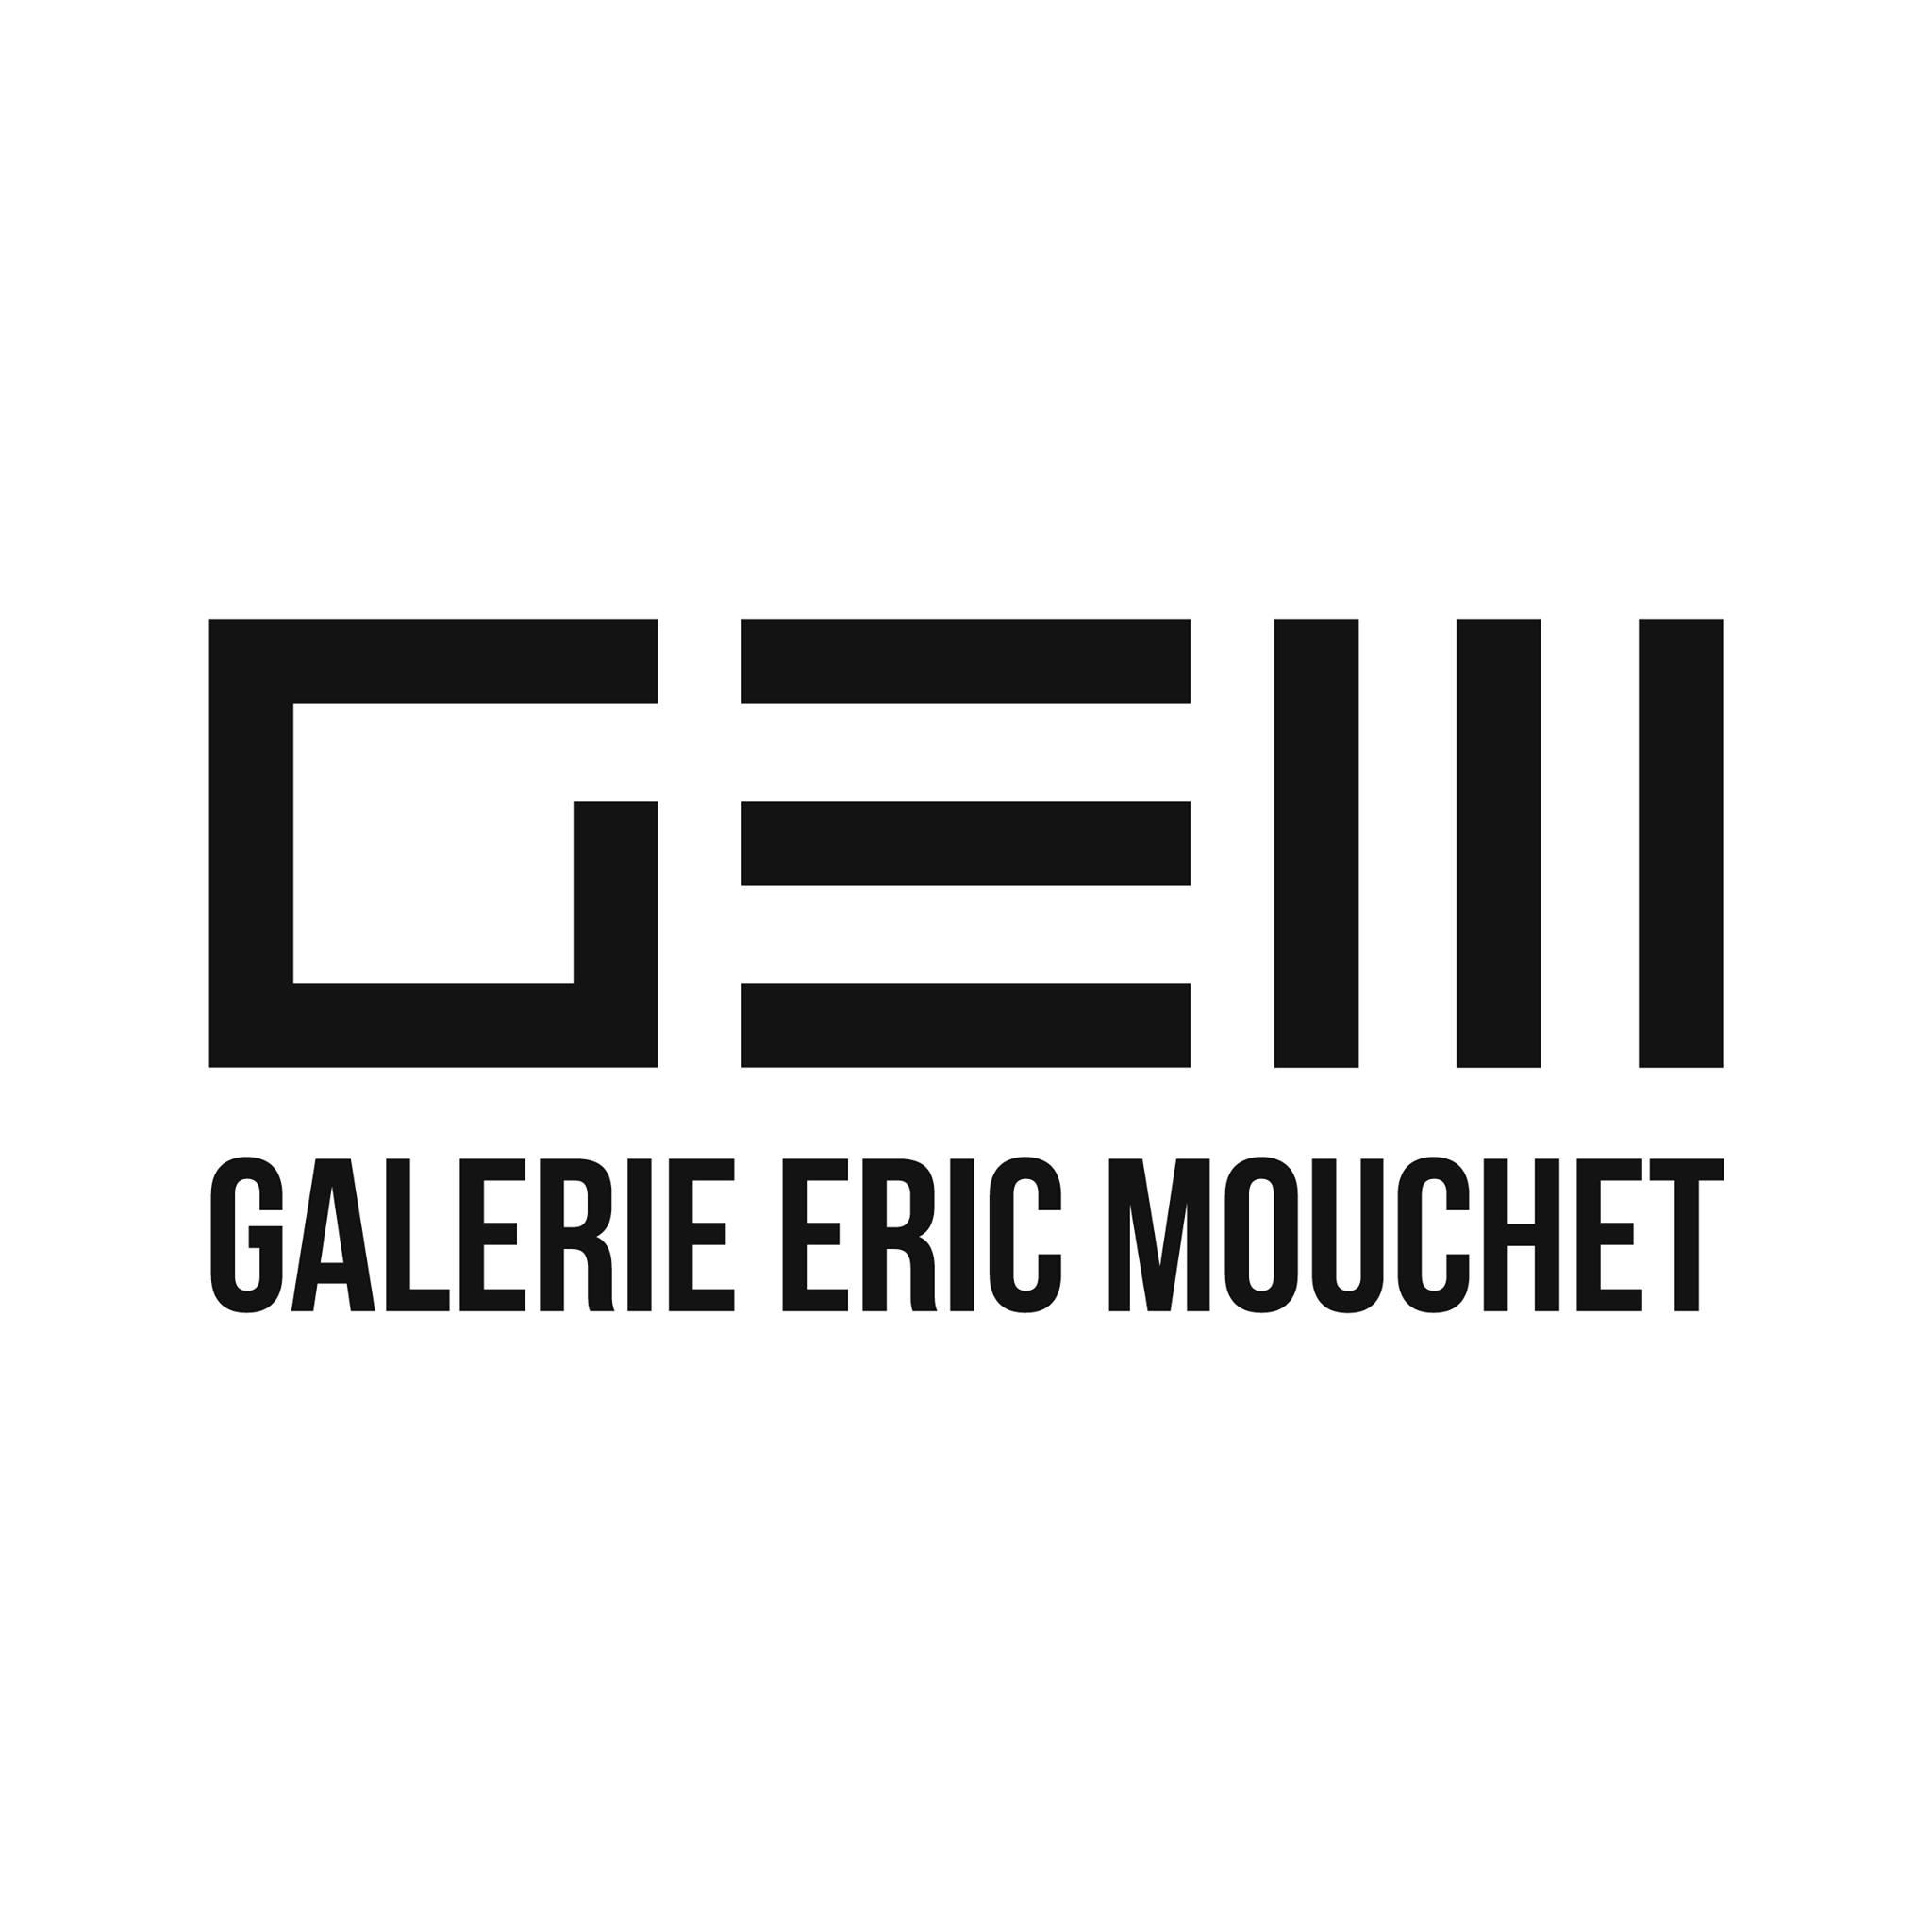 Galerie Eric Mouchet